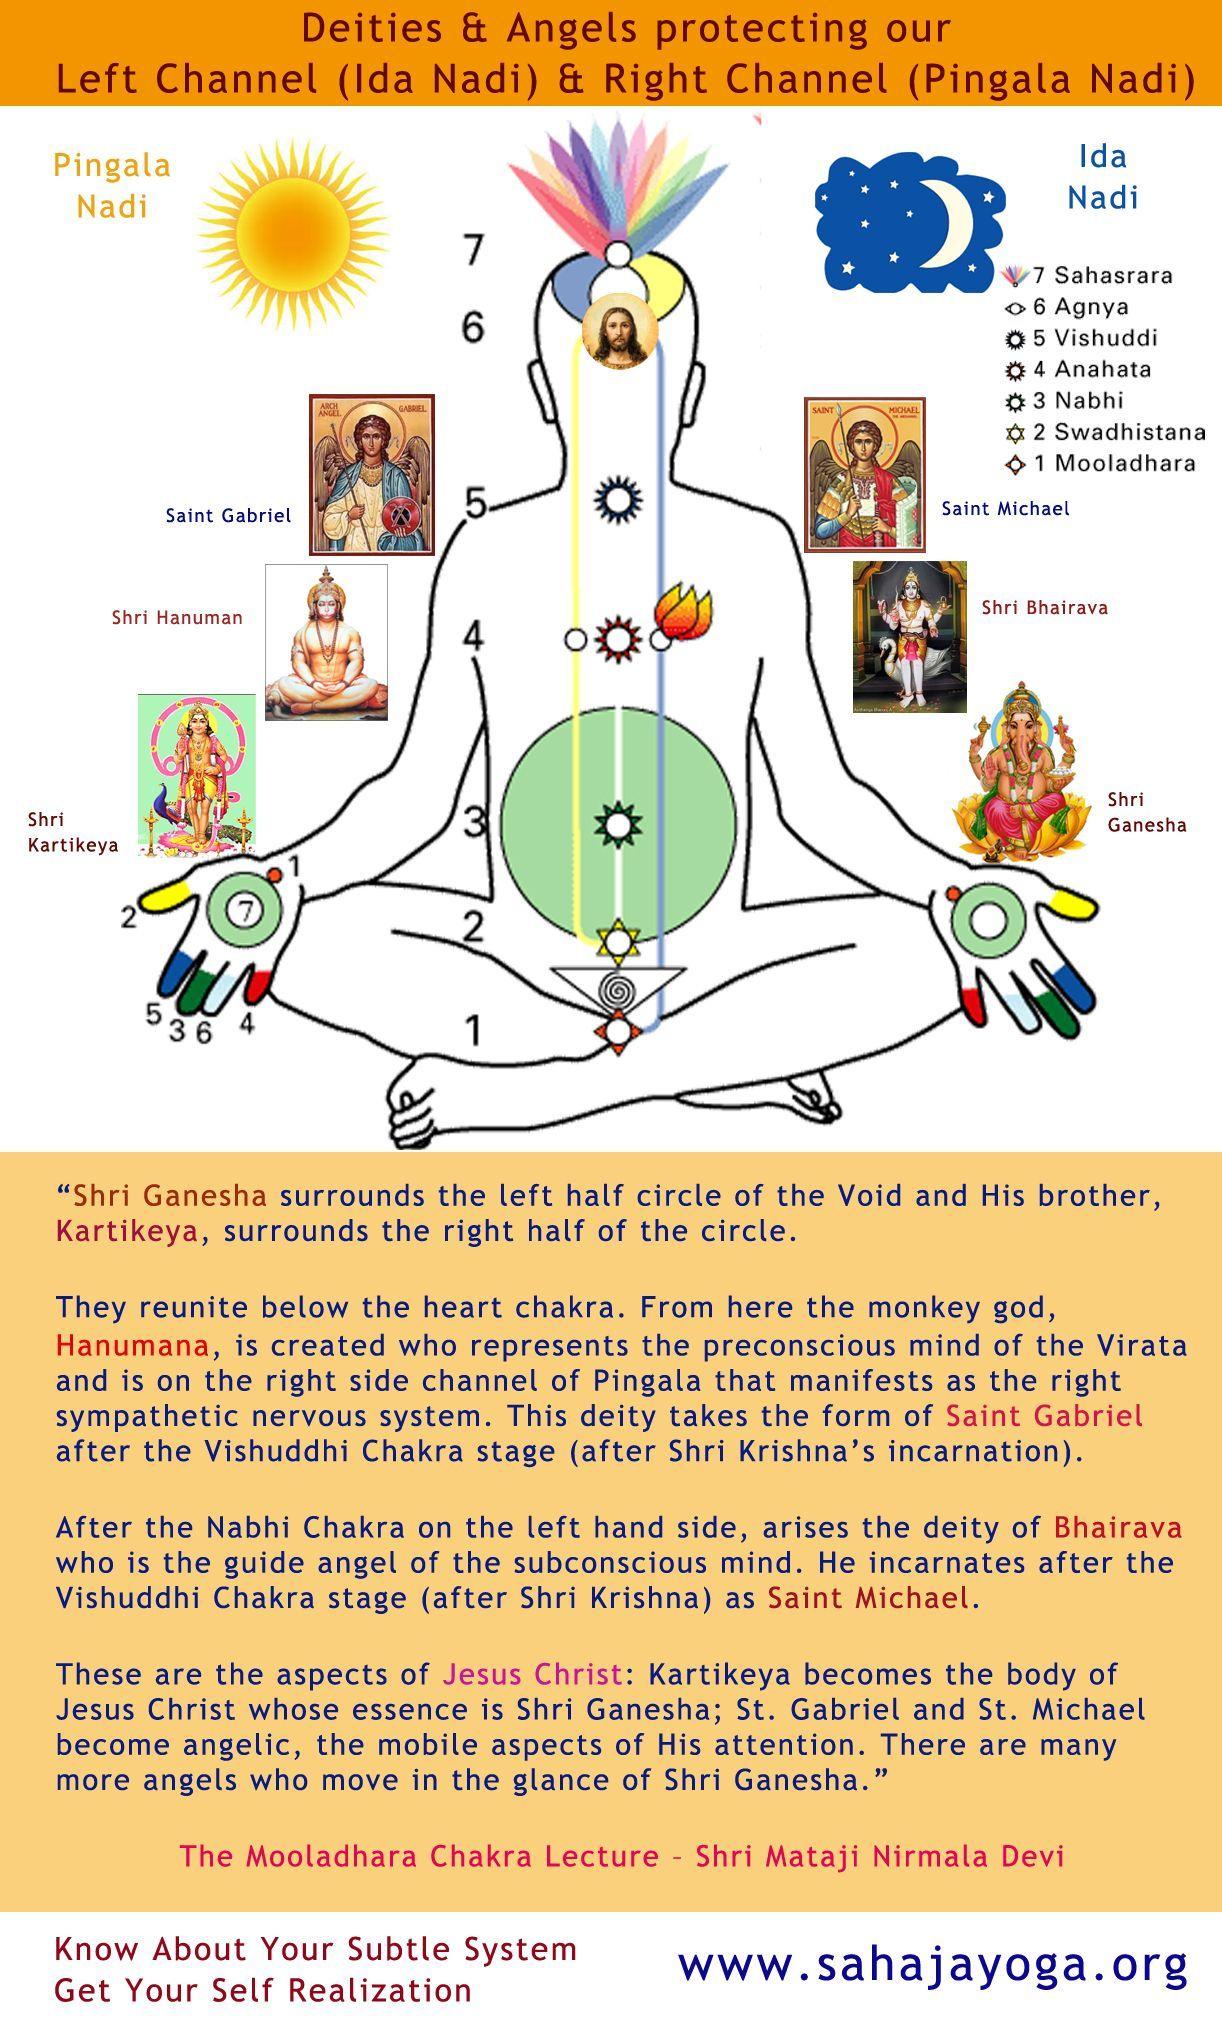 Deities Angels Protecting Our Left Channel Ida Nadi Right Channel Pingala Nadi Sahaja Yoga Meditation Sahaja Yoga Kundalini Yoga